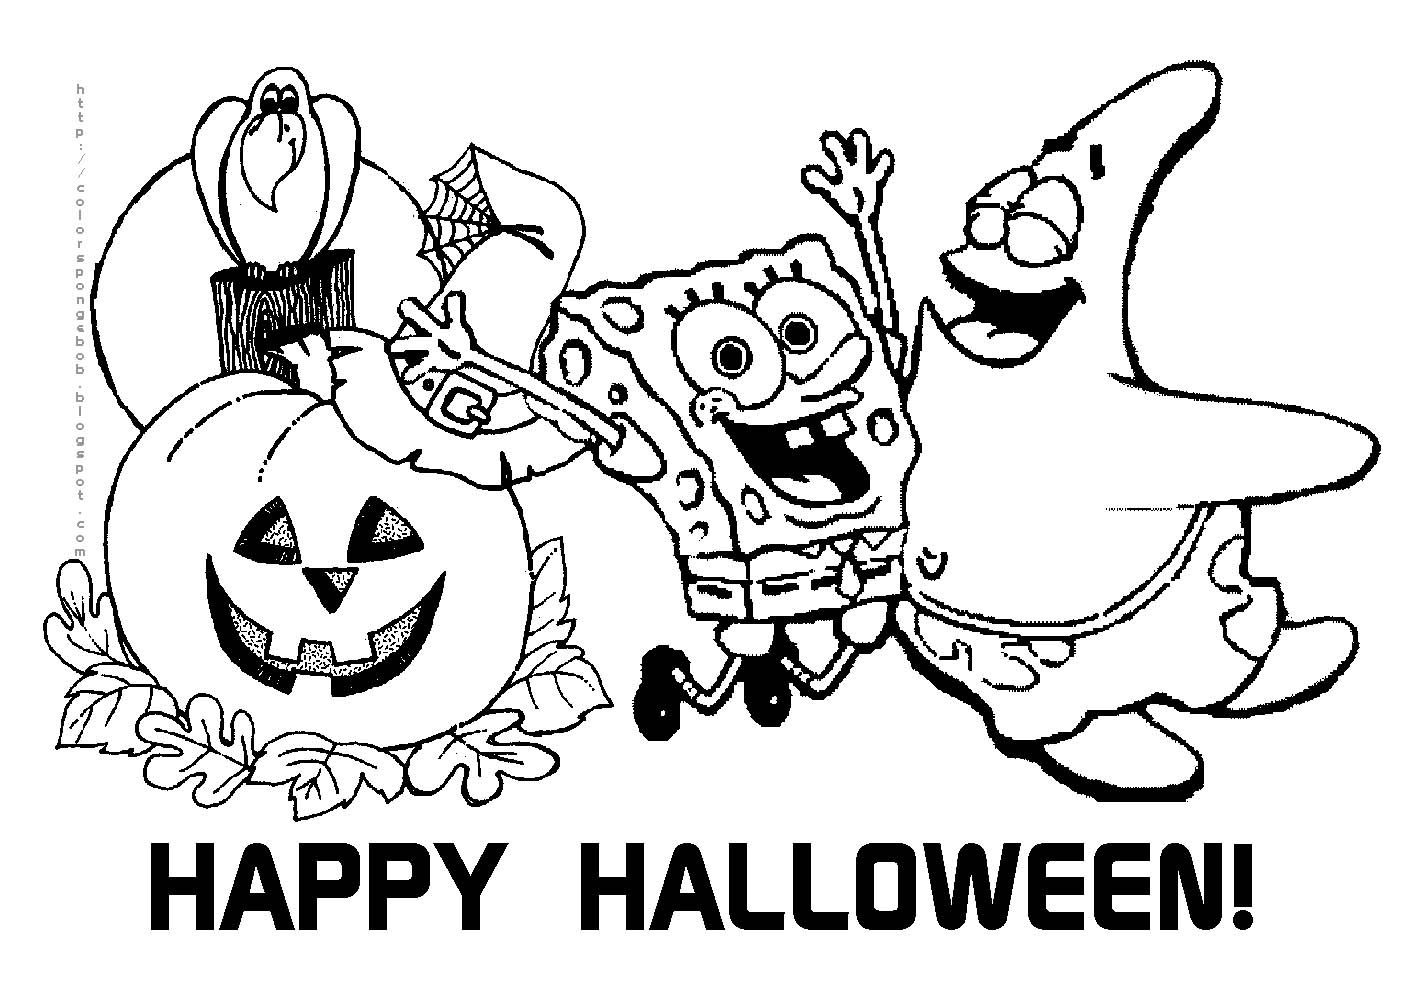 Printable Spongebob Coloring Pages Halloween Coloring Pages Free Halloween Coloring Pages Halloween Coloring Pages Printable